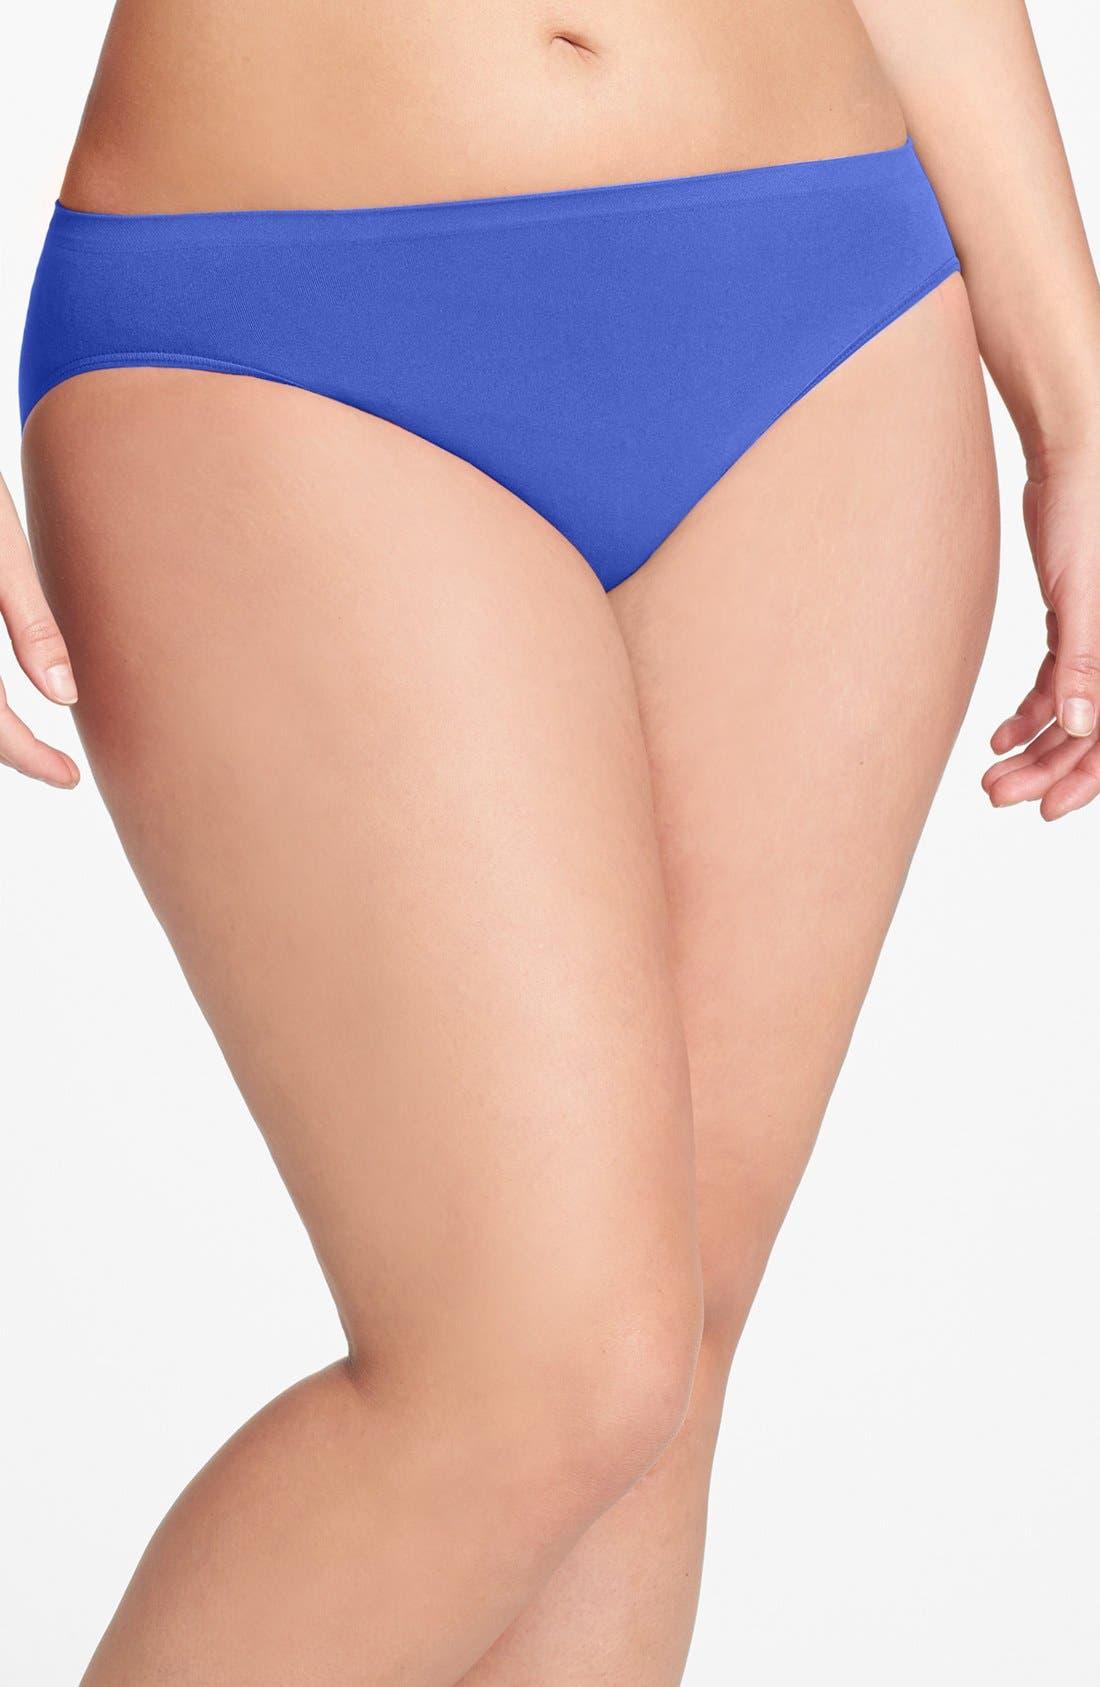 Main Image - Shimera Seamless High Cut Panties (Plus Size) (3 for $33)